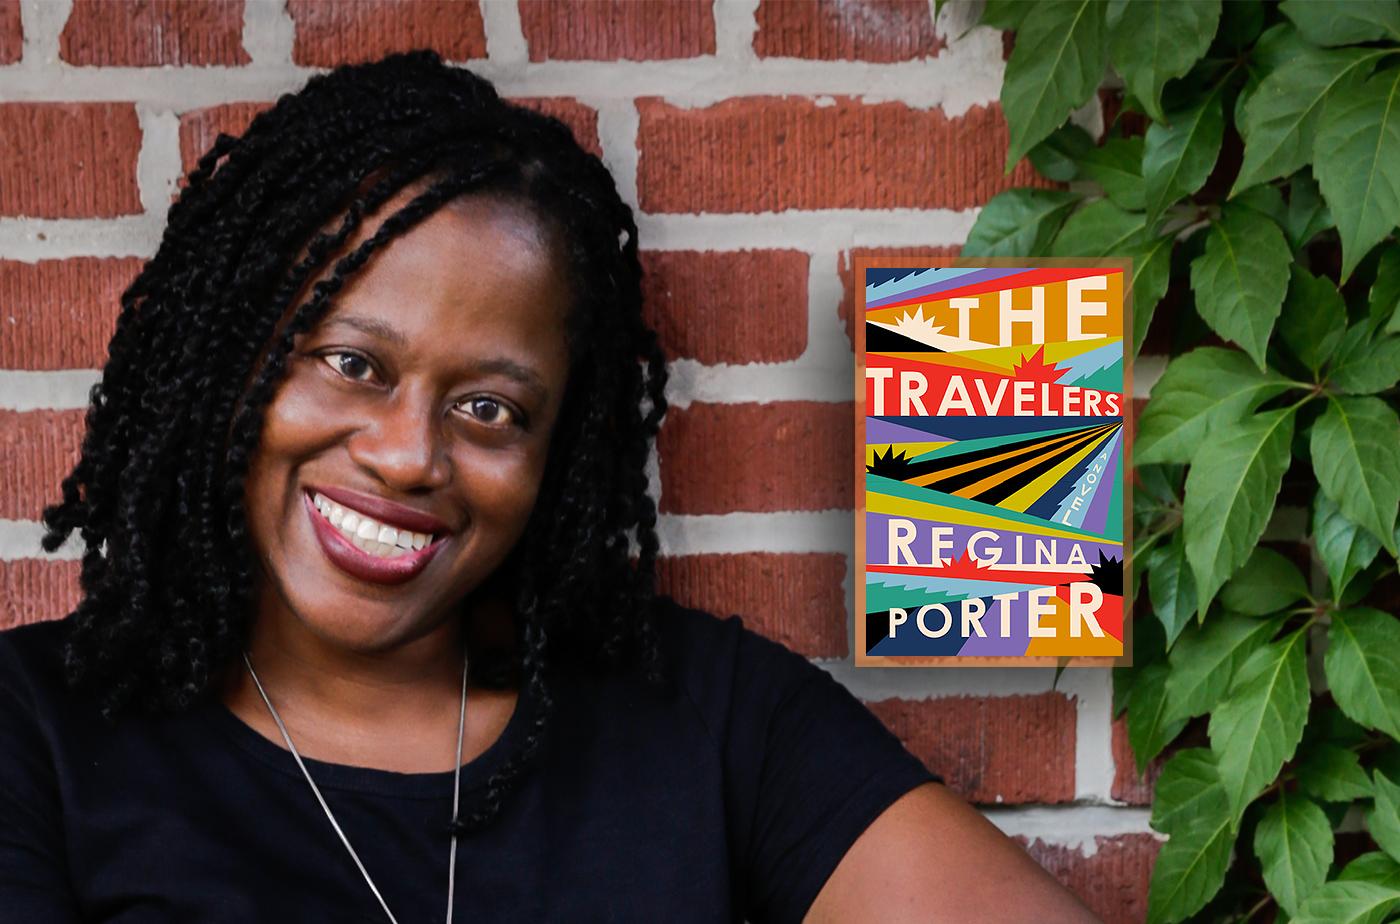 Catapult  classes: Regina Porter, 6-Week Fiction Workshop: Building Your First-Person Narrative, Fiction, Workshop